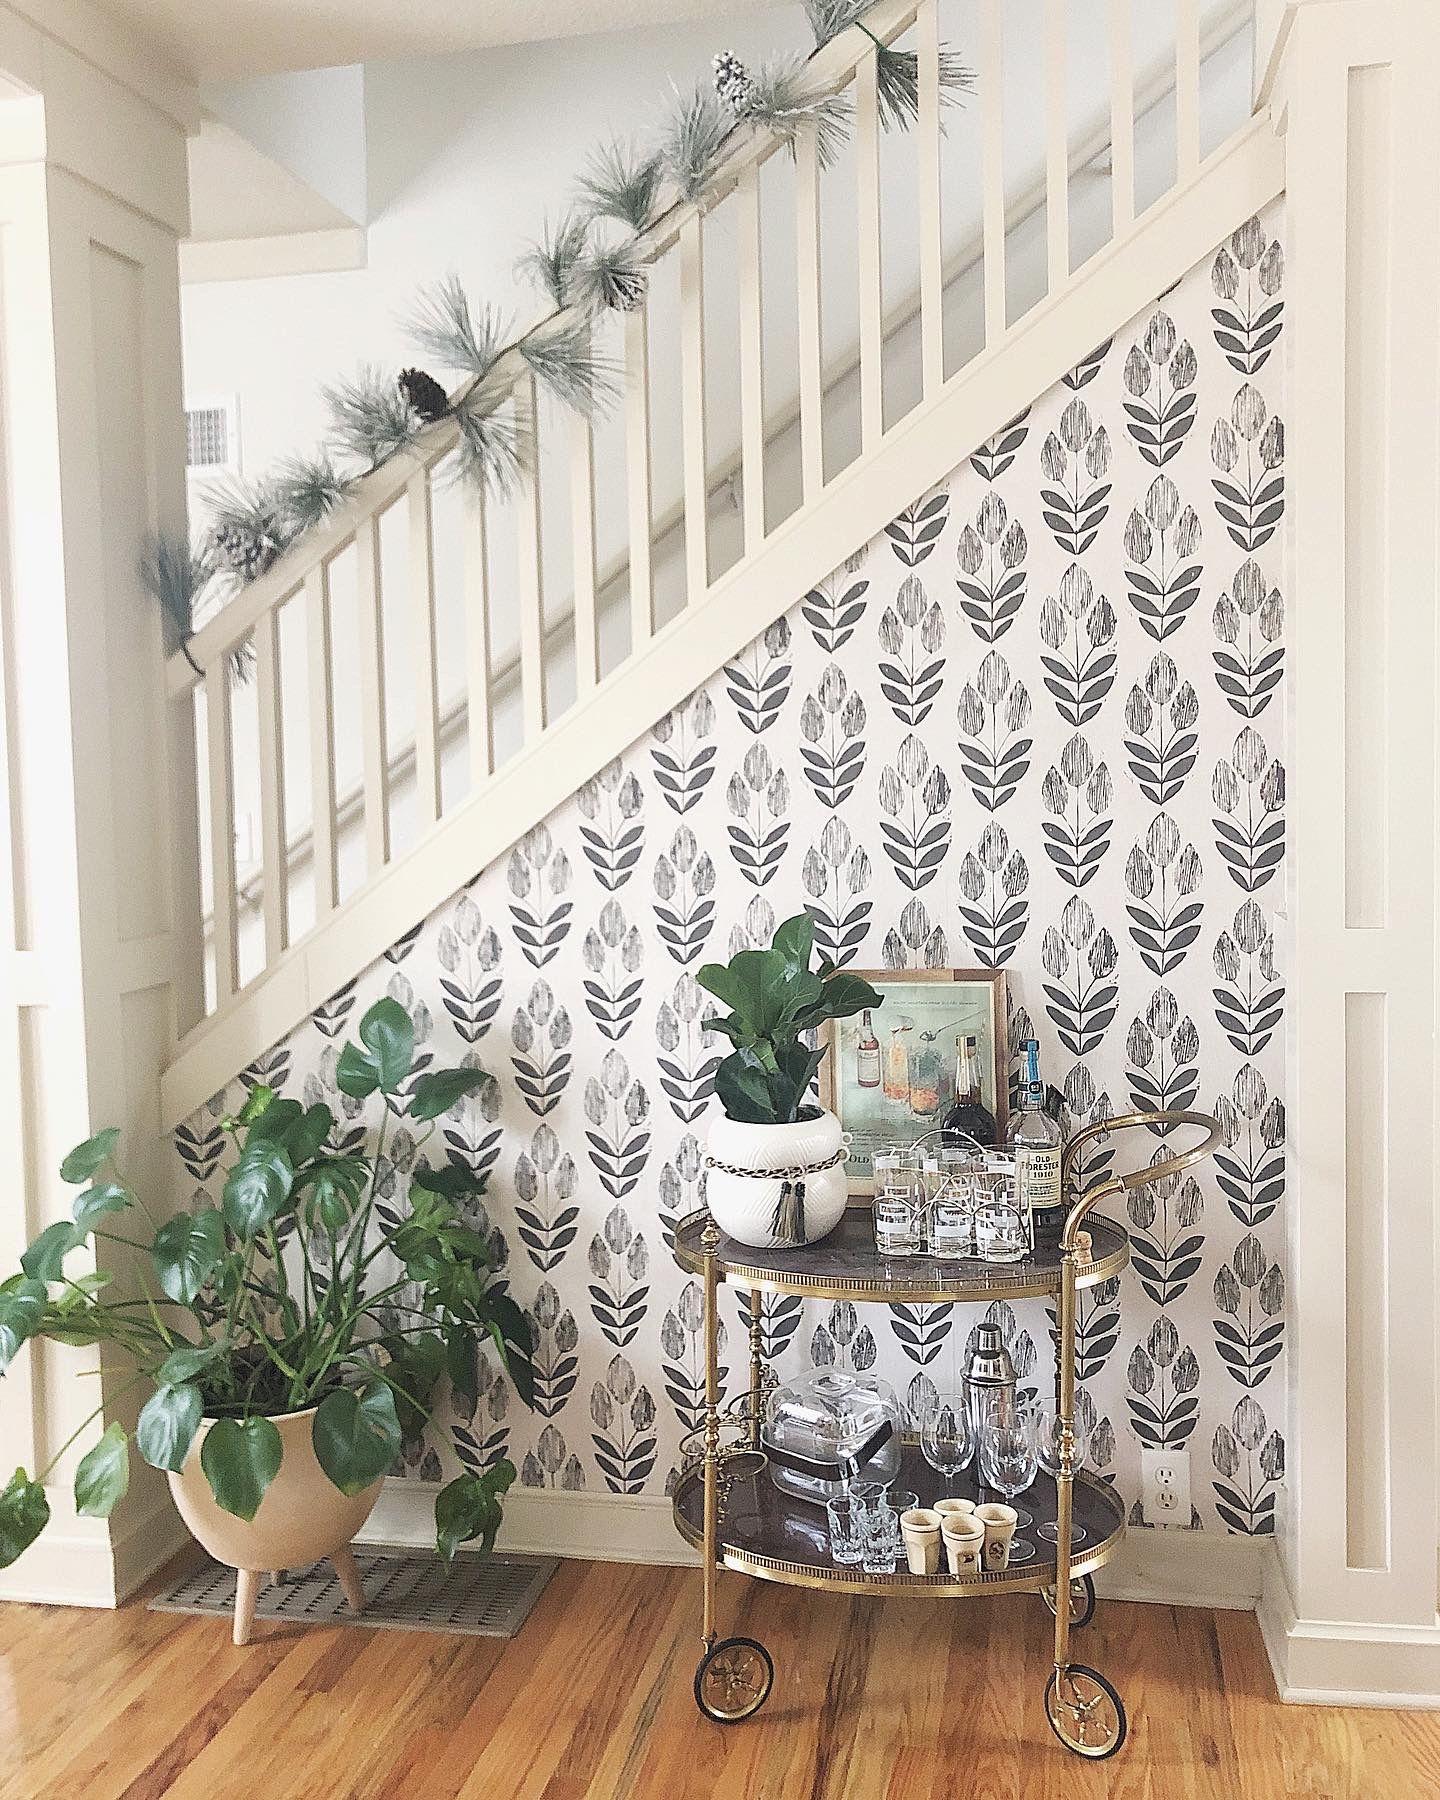 A little Scandinavian wallpaper accent wall at the Airbnb ...